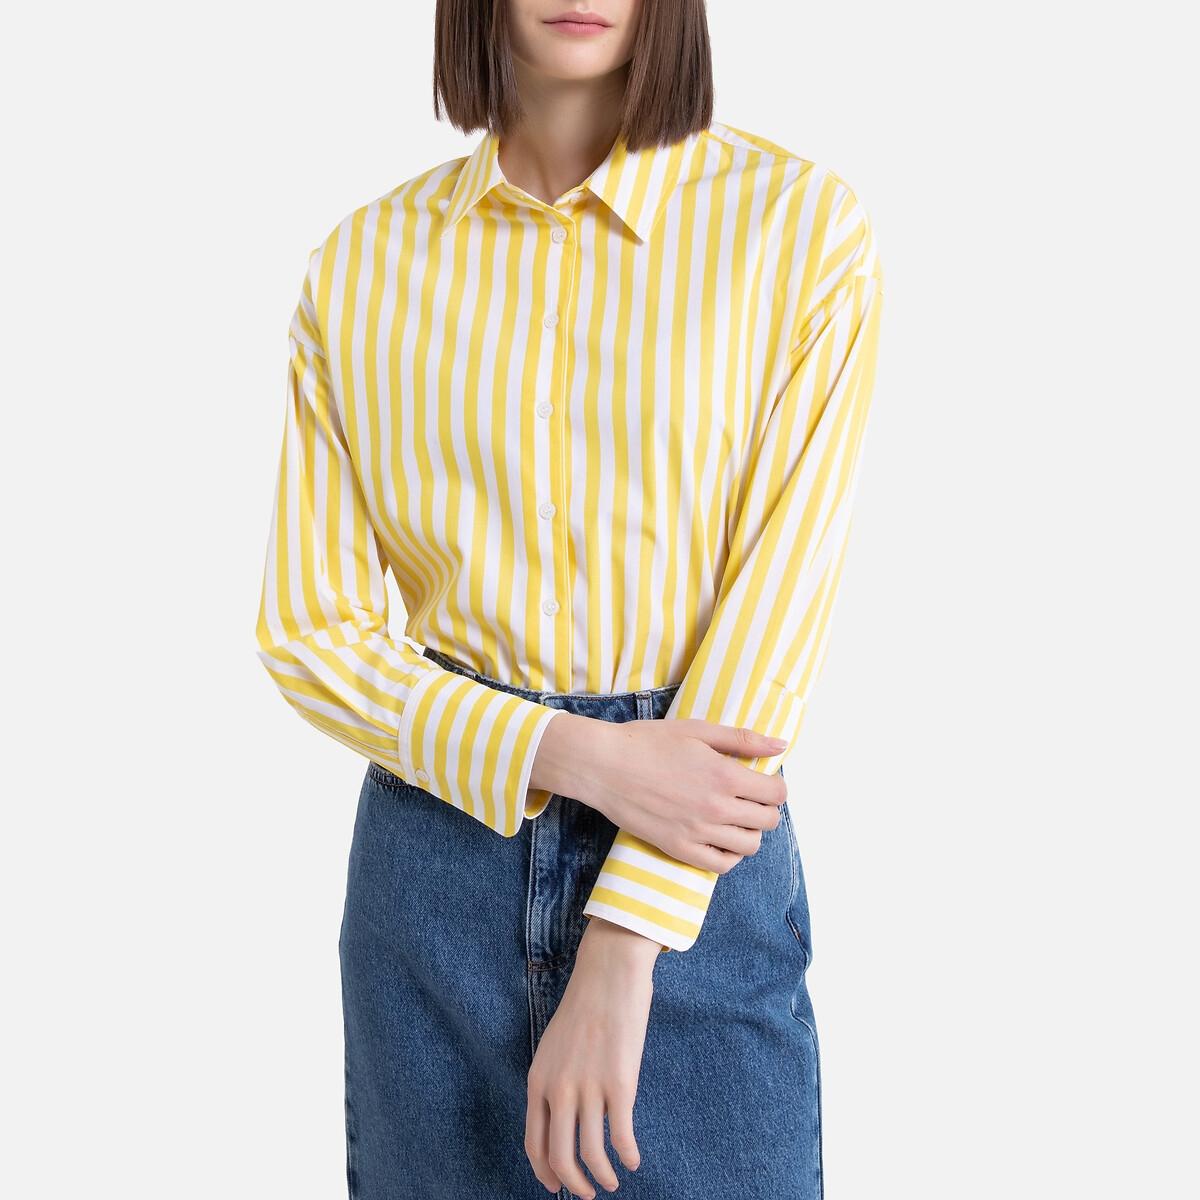 Camisa a rayas con corte amplio y manga larga